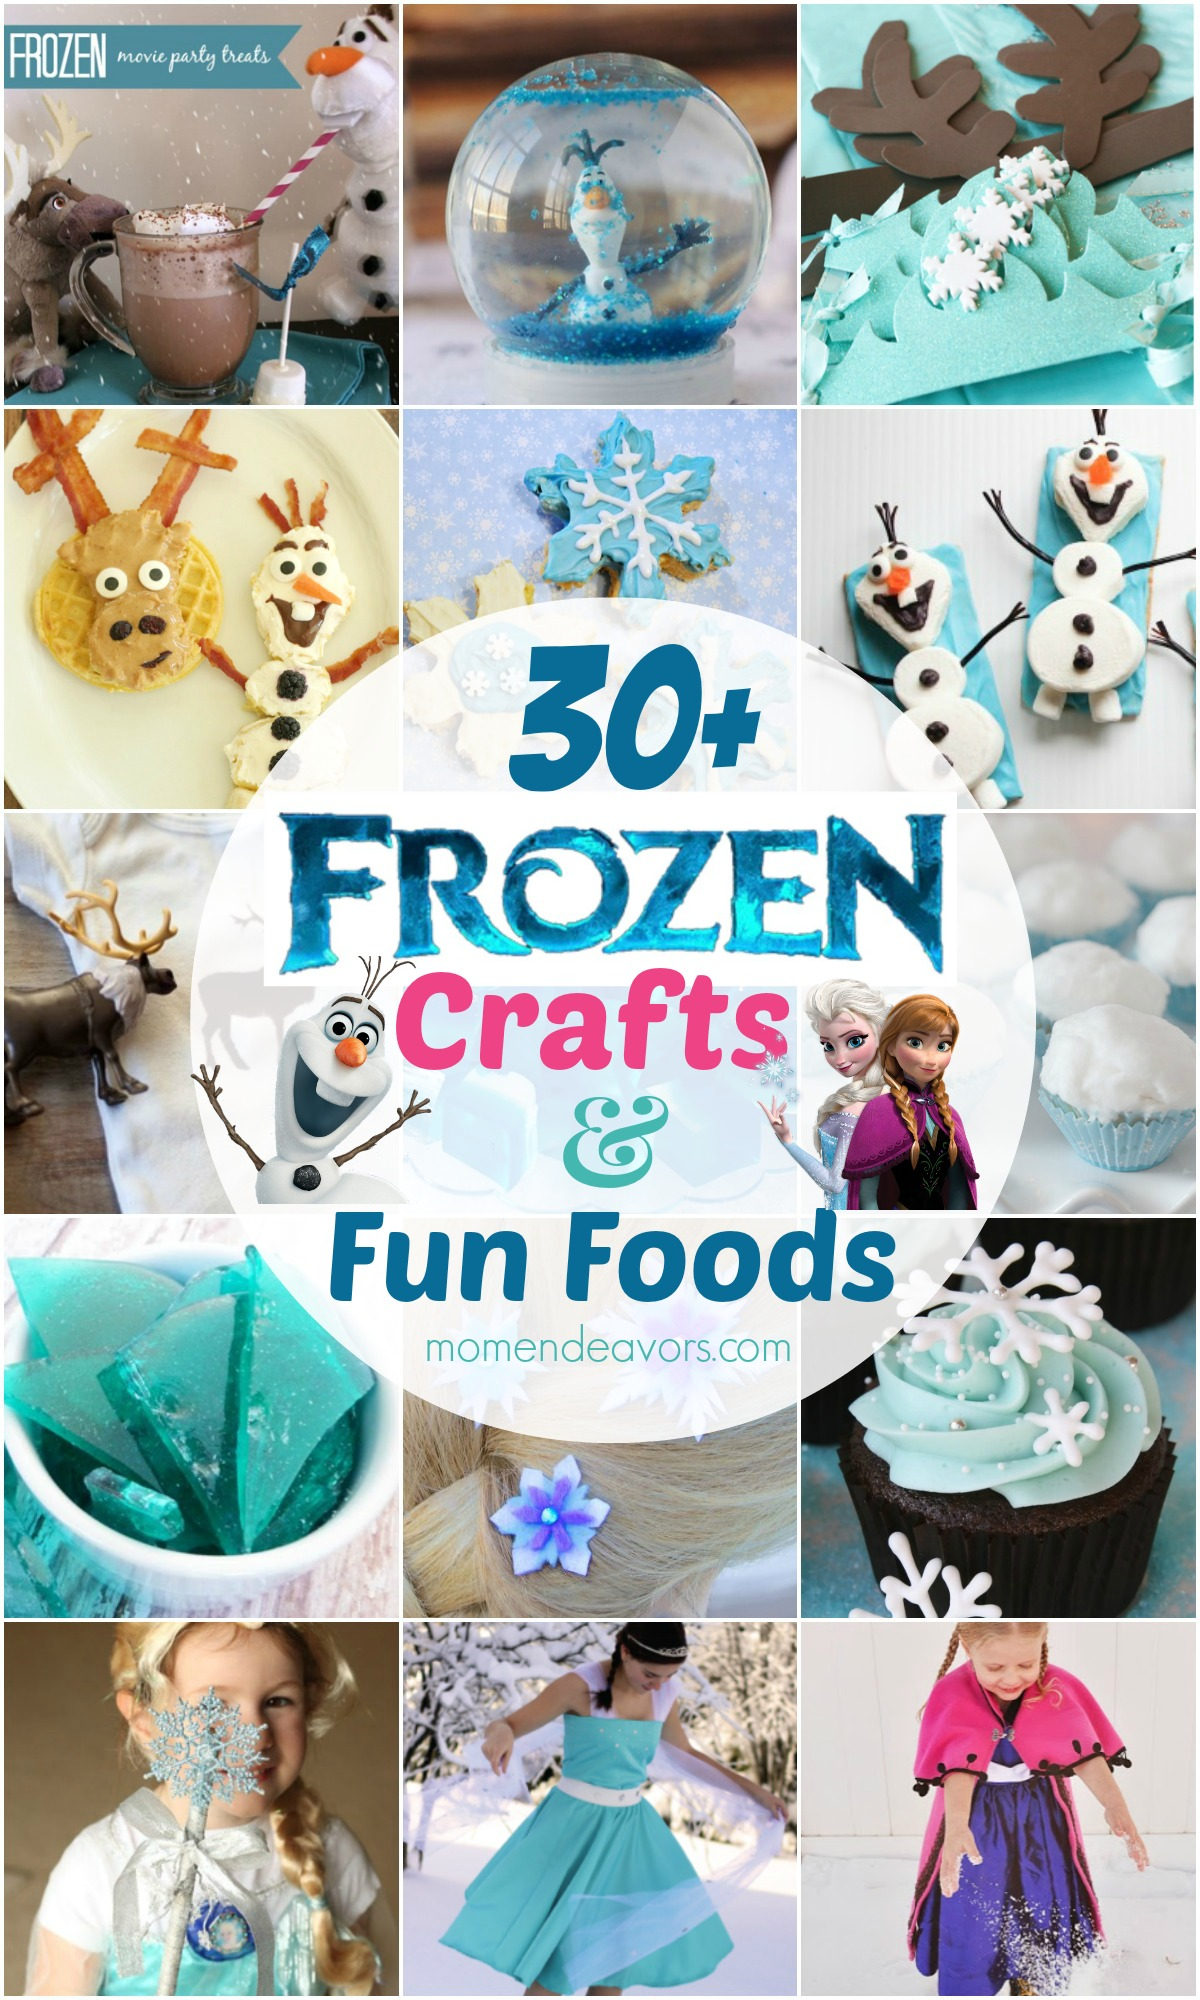 30 Disney Frozen Crafts Fun Food Ideas